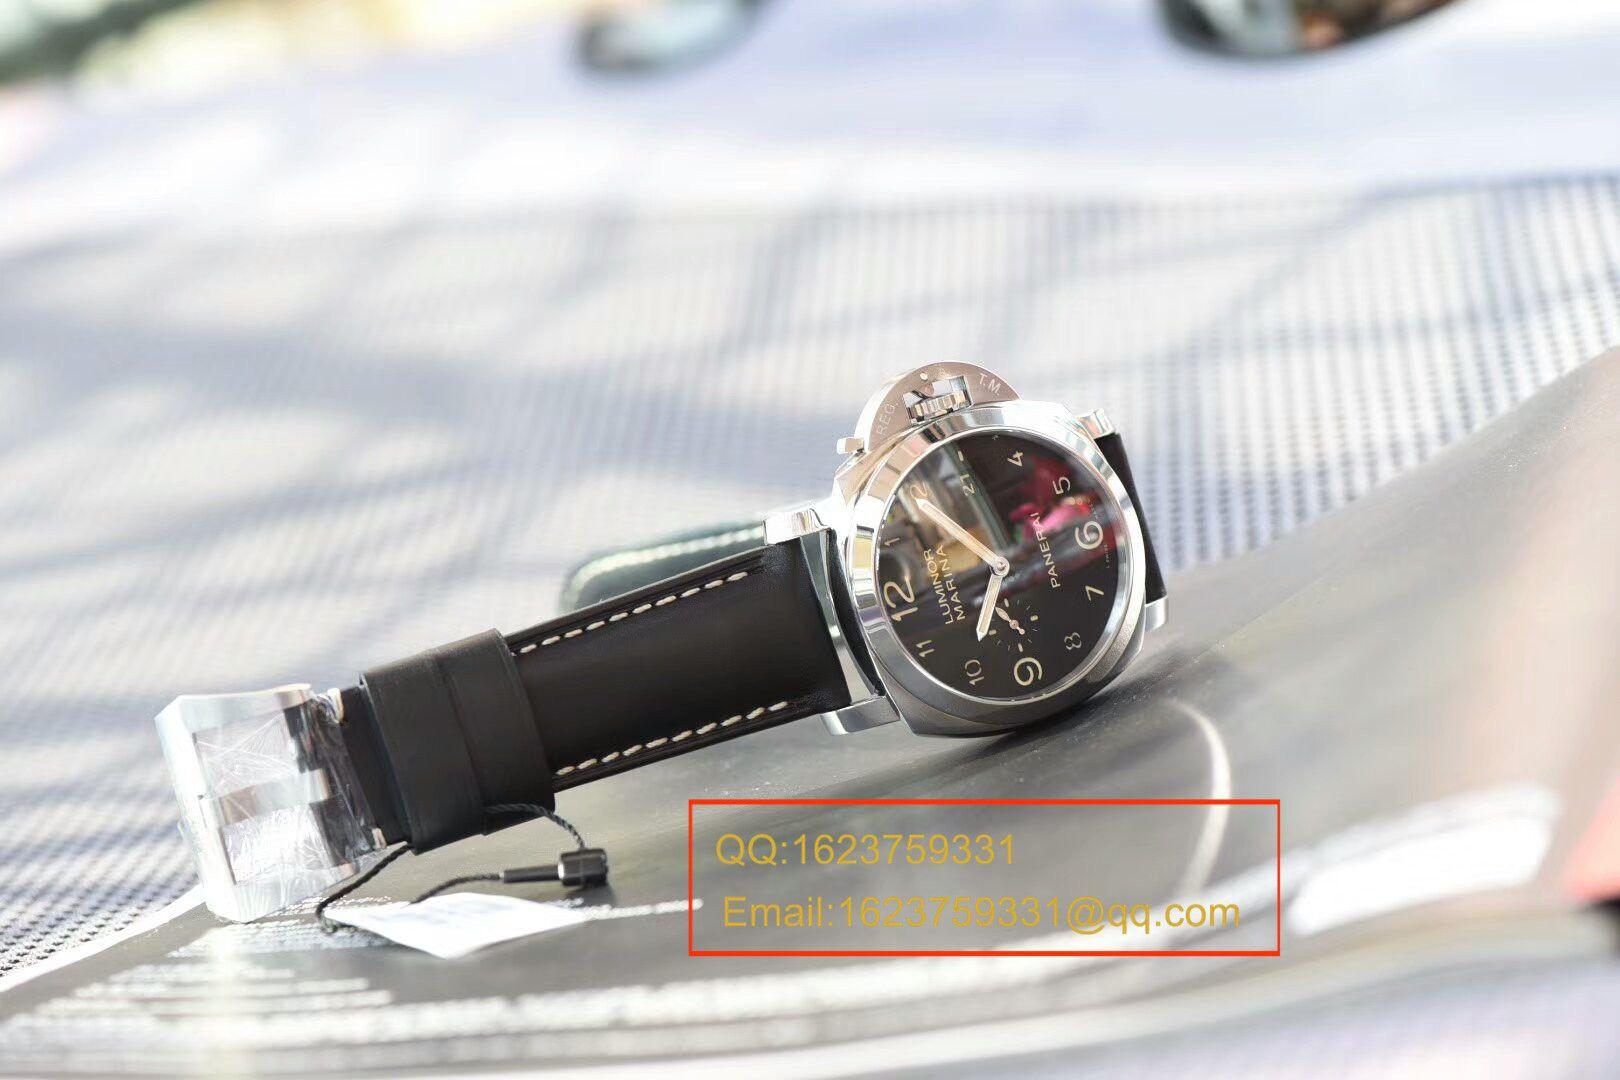 【VS厂一比一复刻高仿手表】沛纳海LUMINOR 1950系列PAM 00359腕表 / VSPAMBA00359